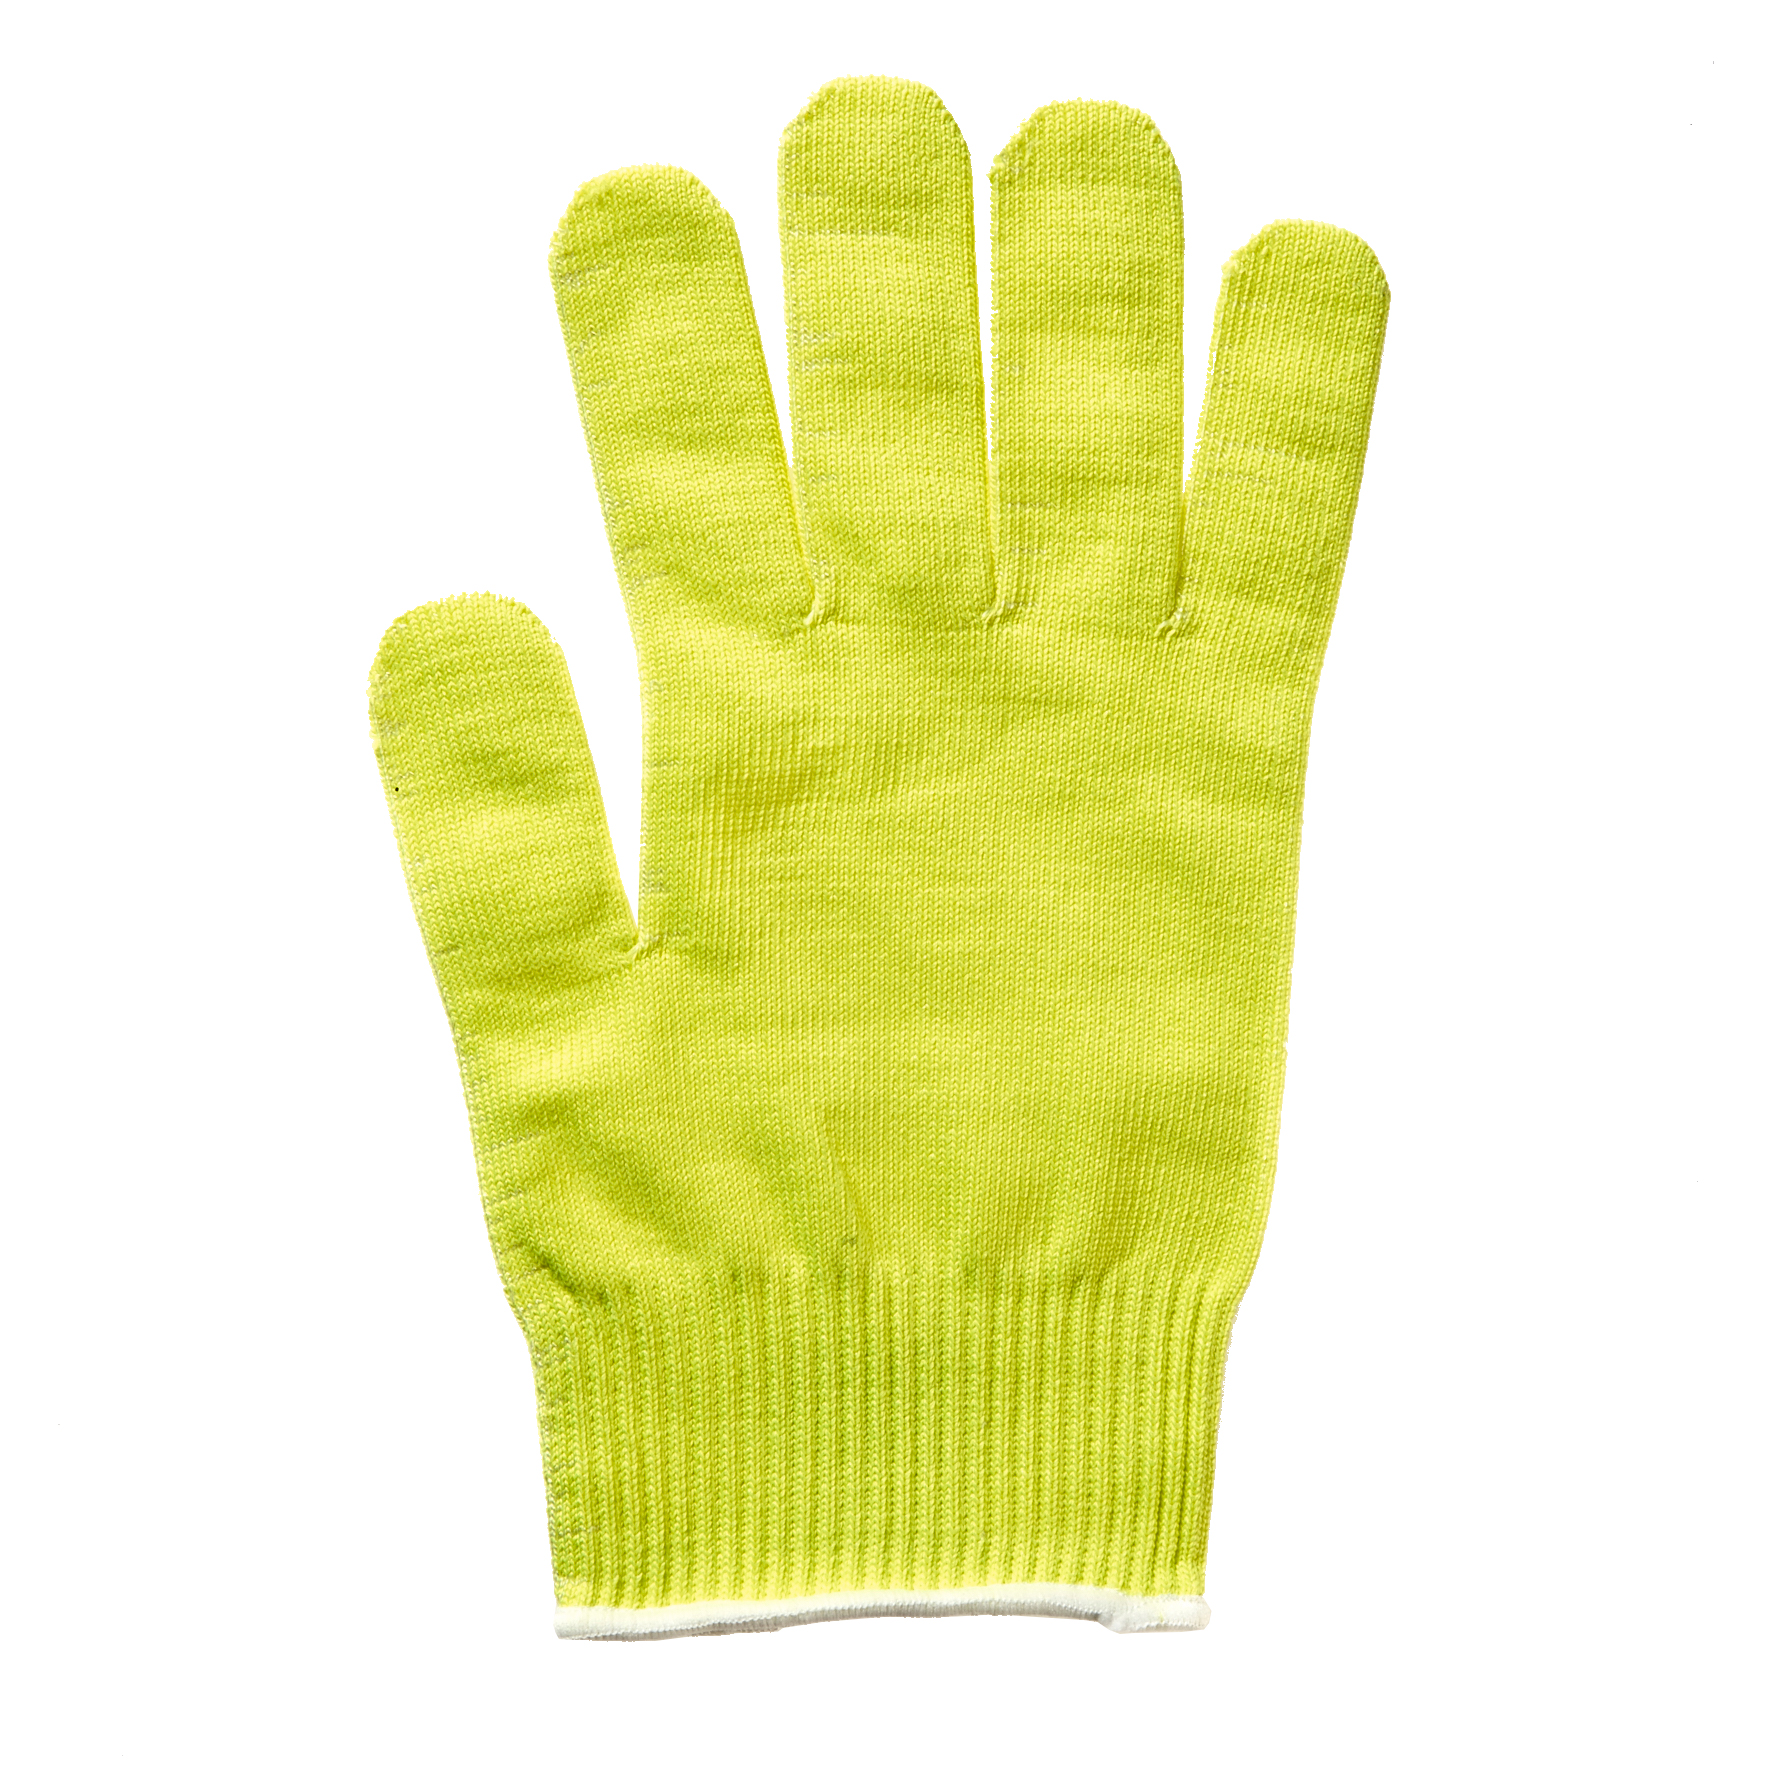 Mercer Culinary M33415YLL glove, cut resistant